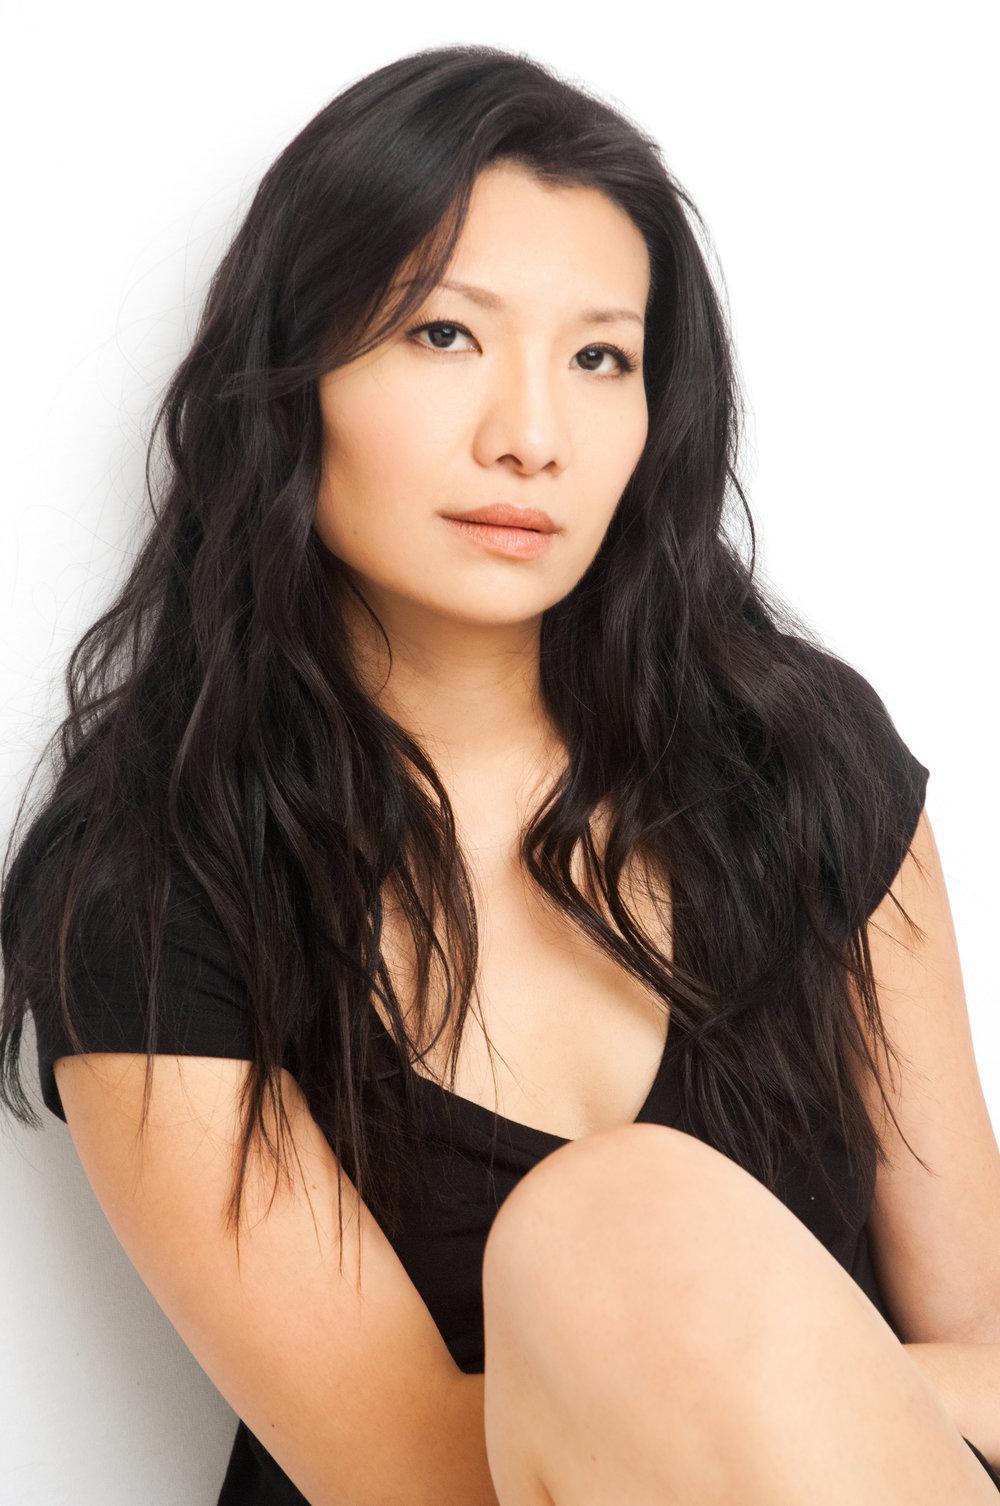 Gwendoline Yeo Nude Photos 4